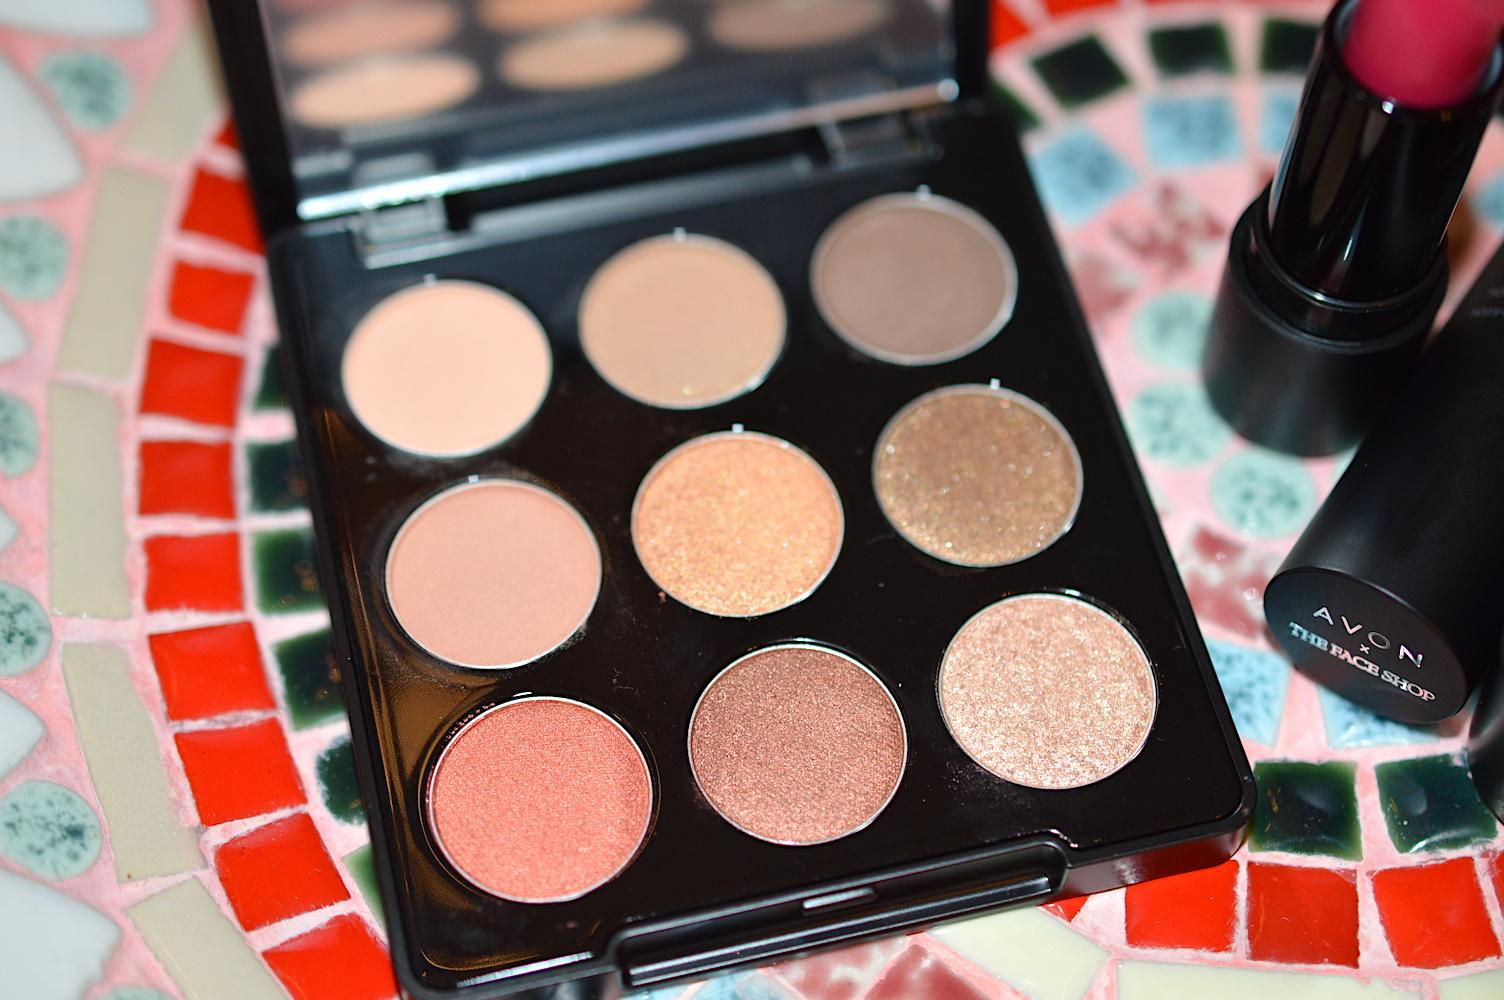 AVON Mono Pop Eyeshadow Palette Review